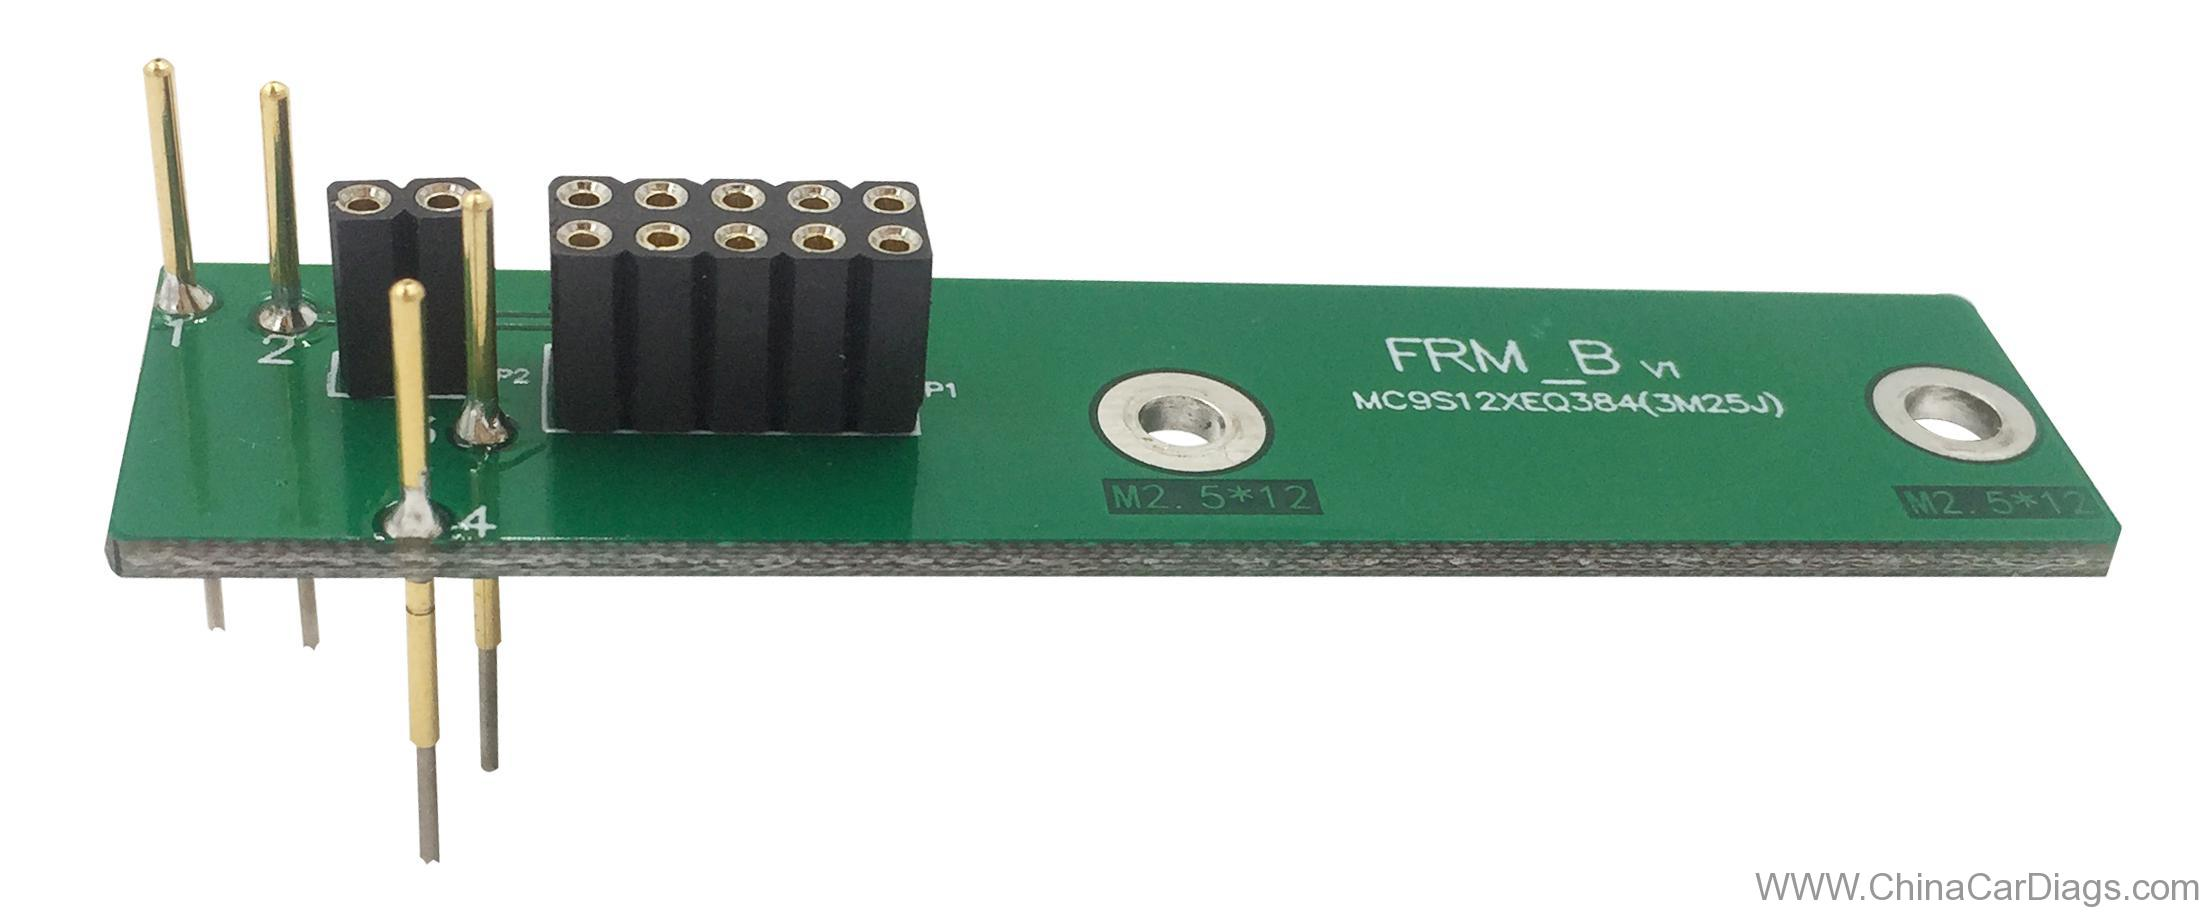 yanhua-acdp-module-8-2